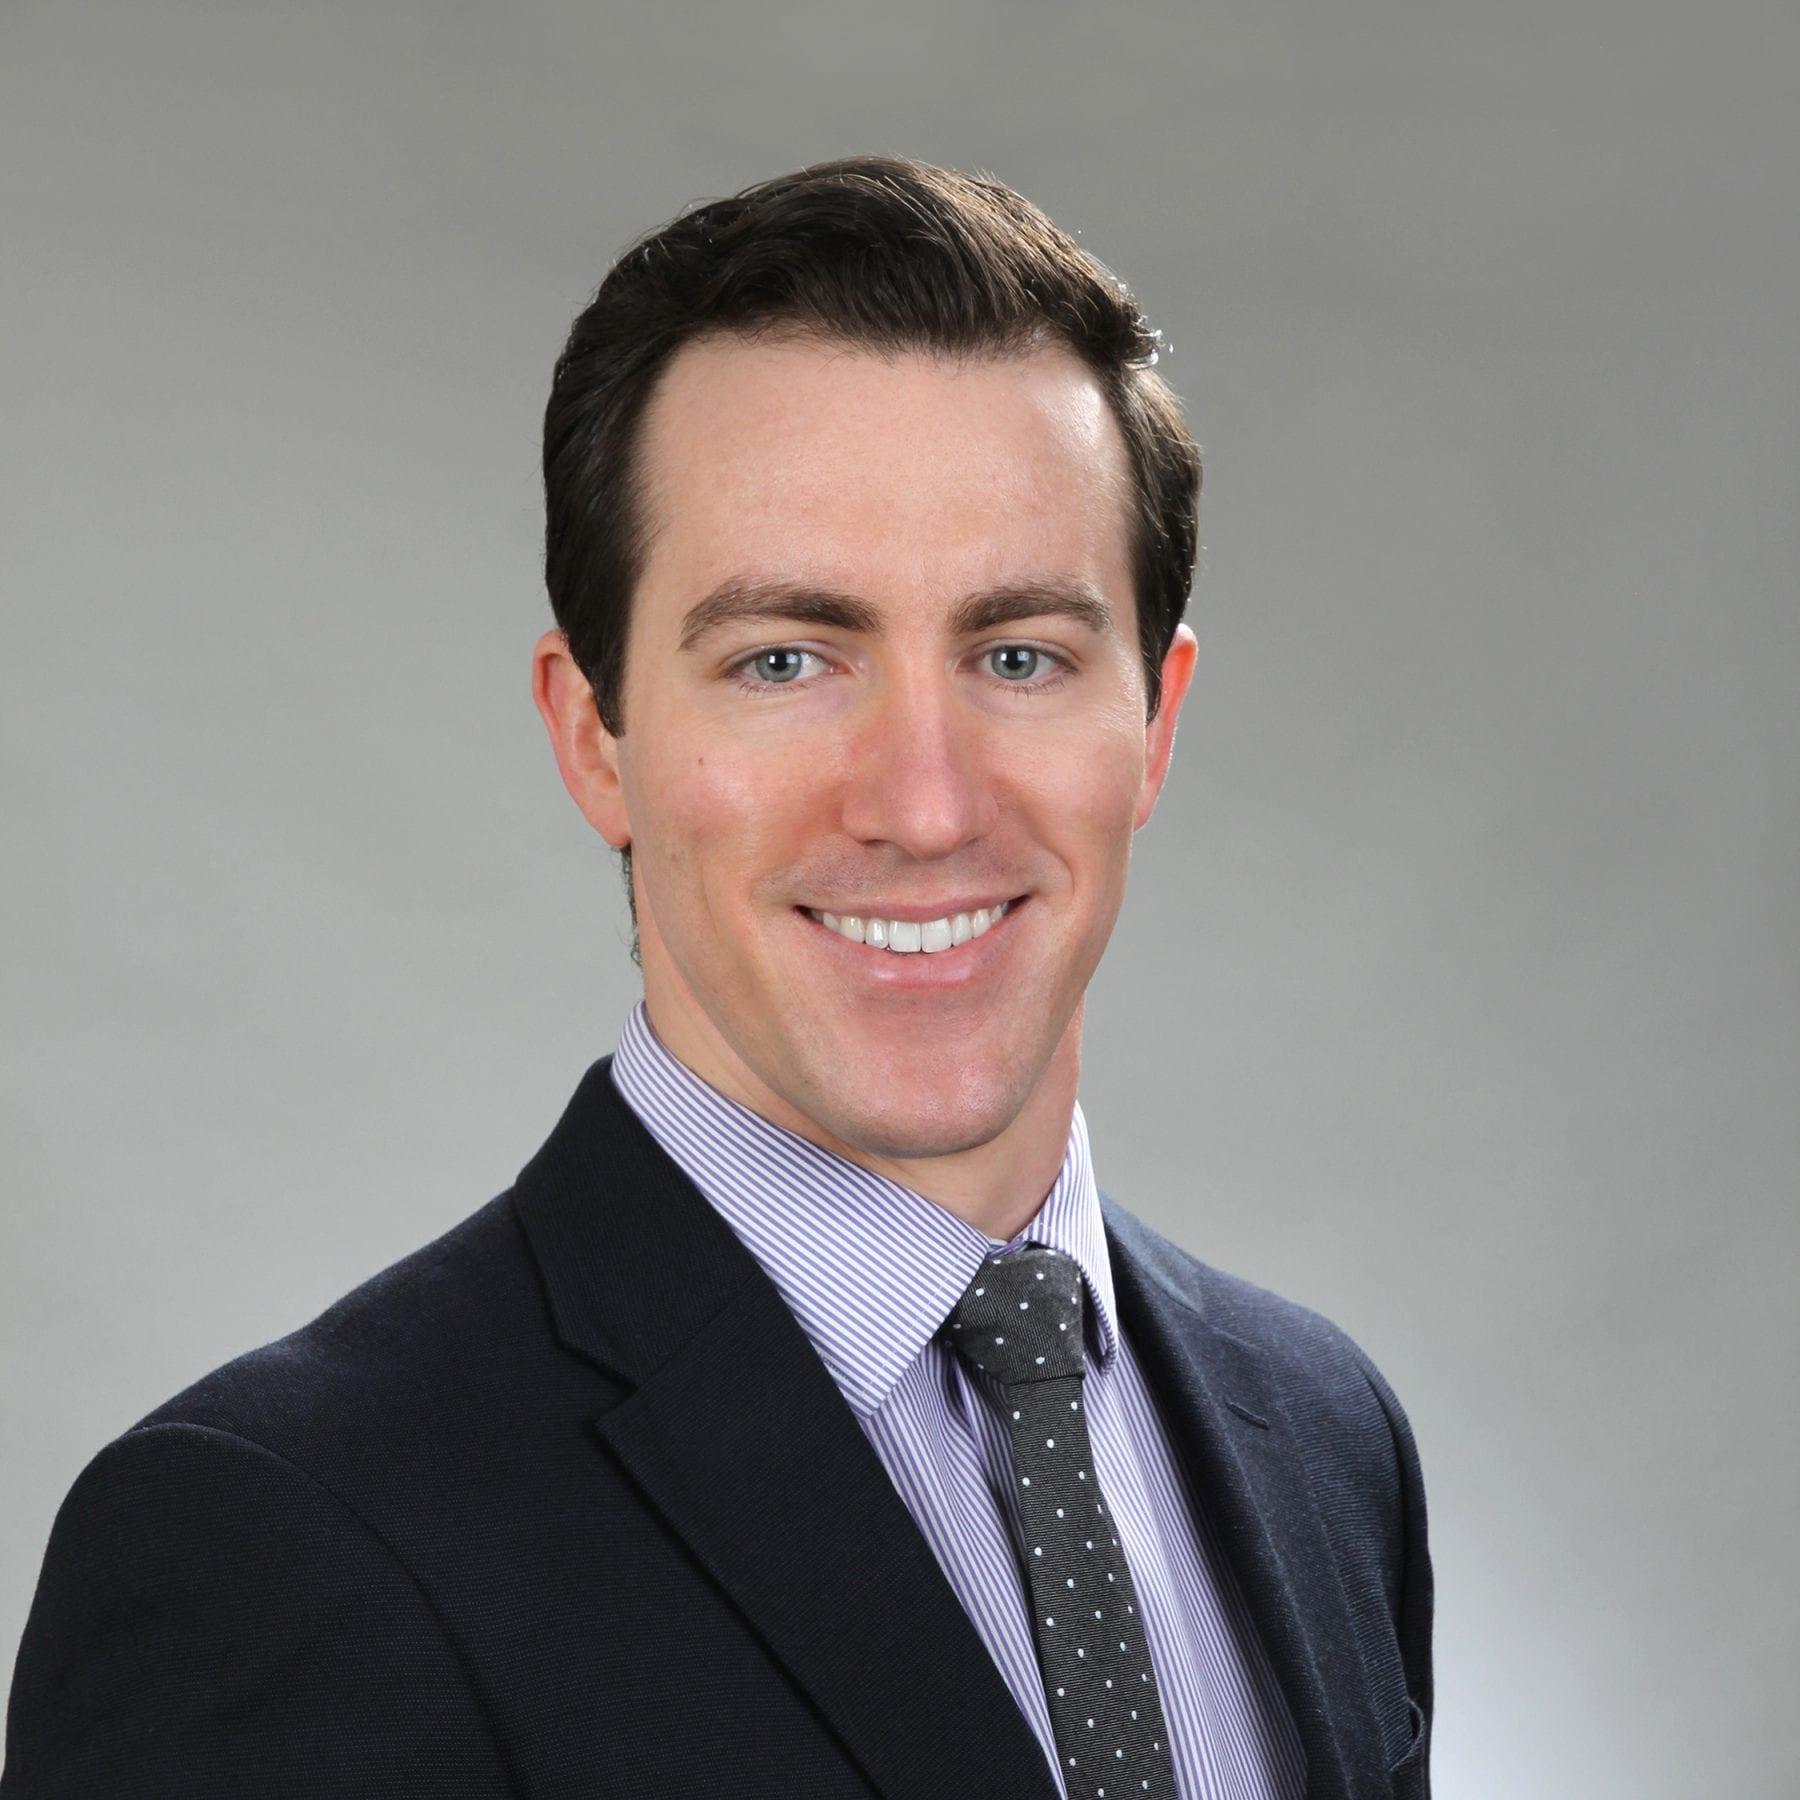 Dr. Nathan Hoffman